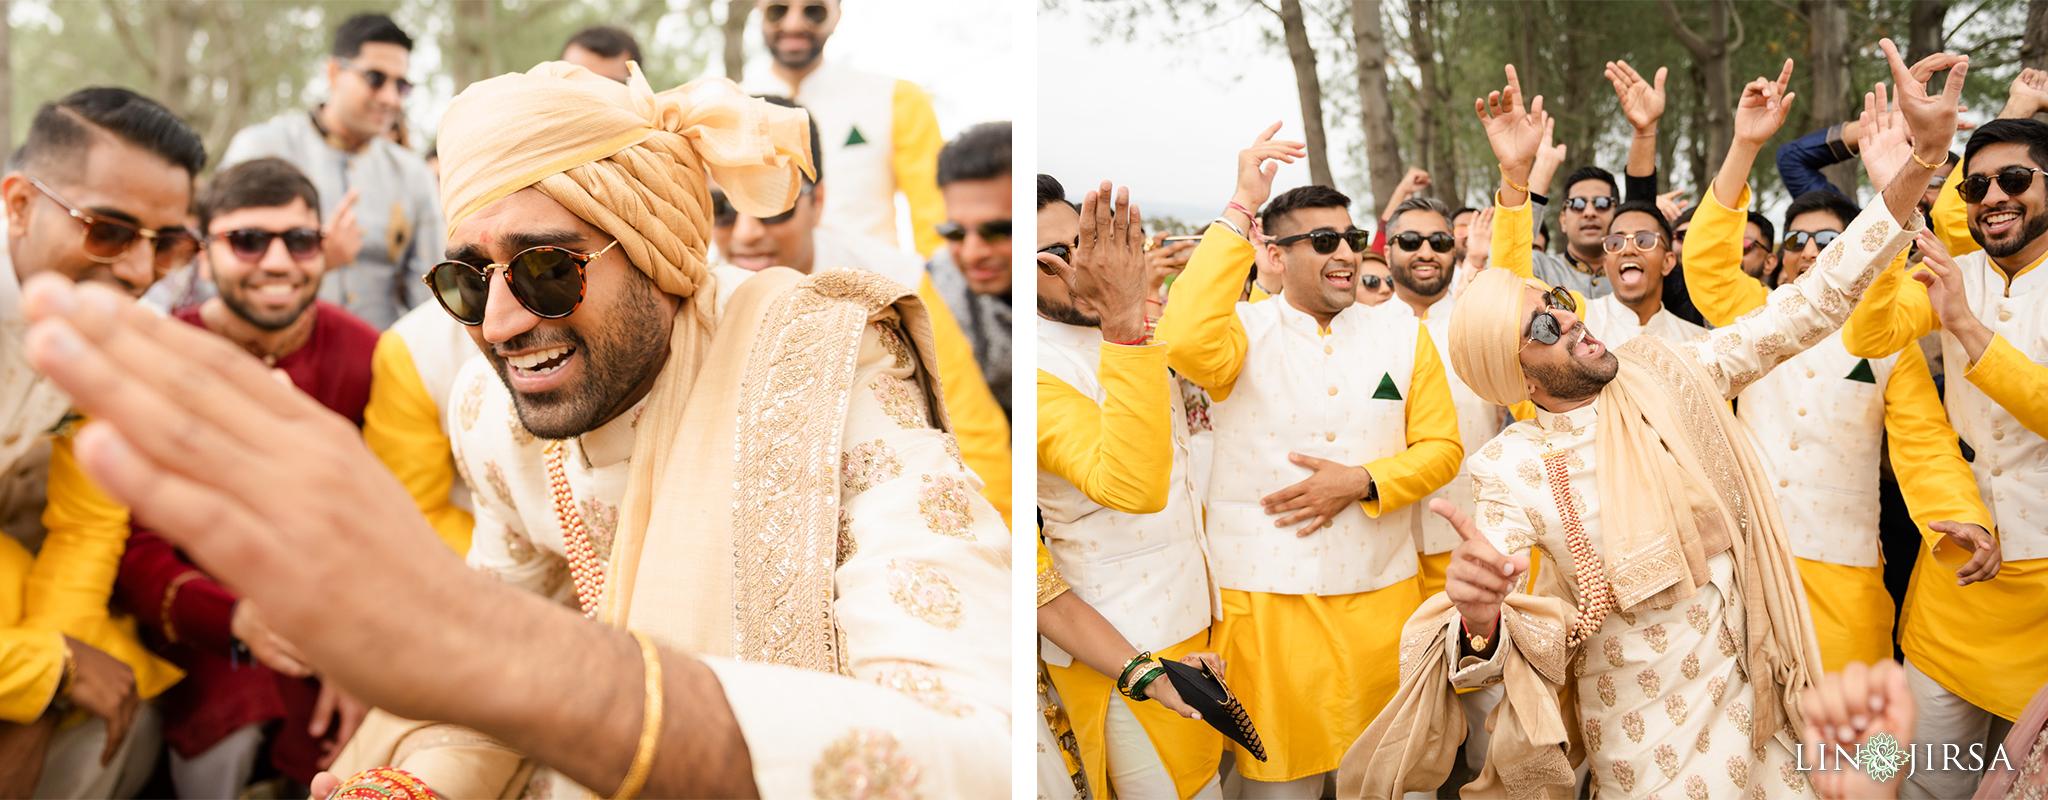 24 Laguna Cliffs Marriott Indian Wedding Reception Photography